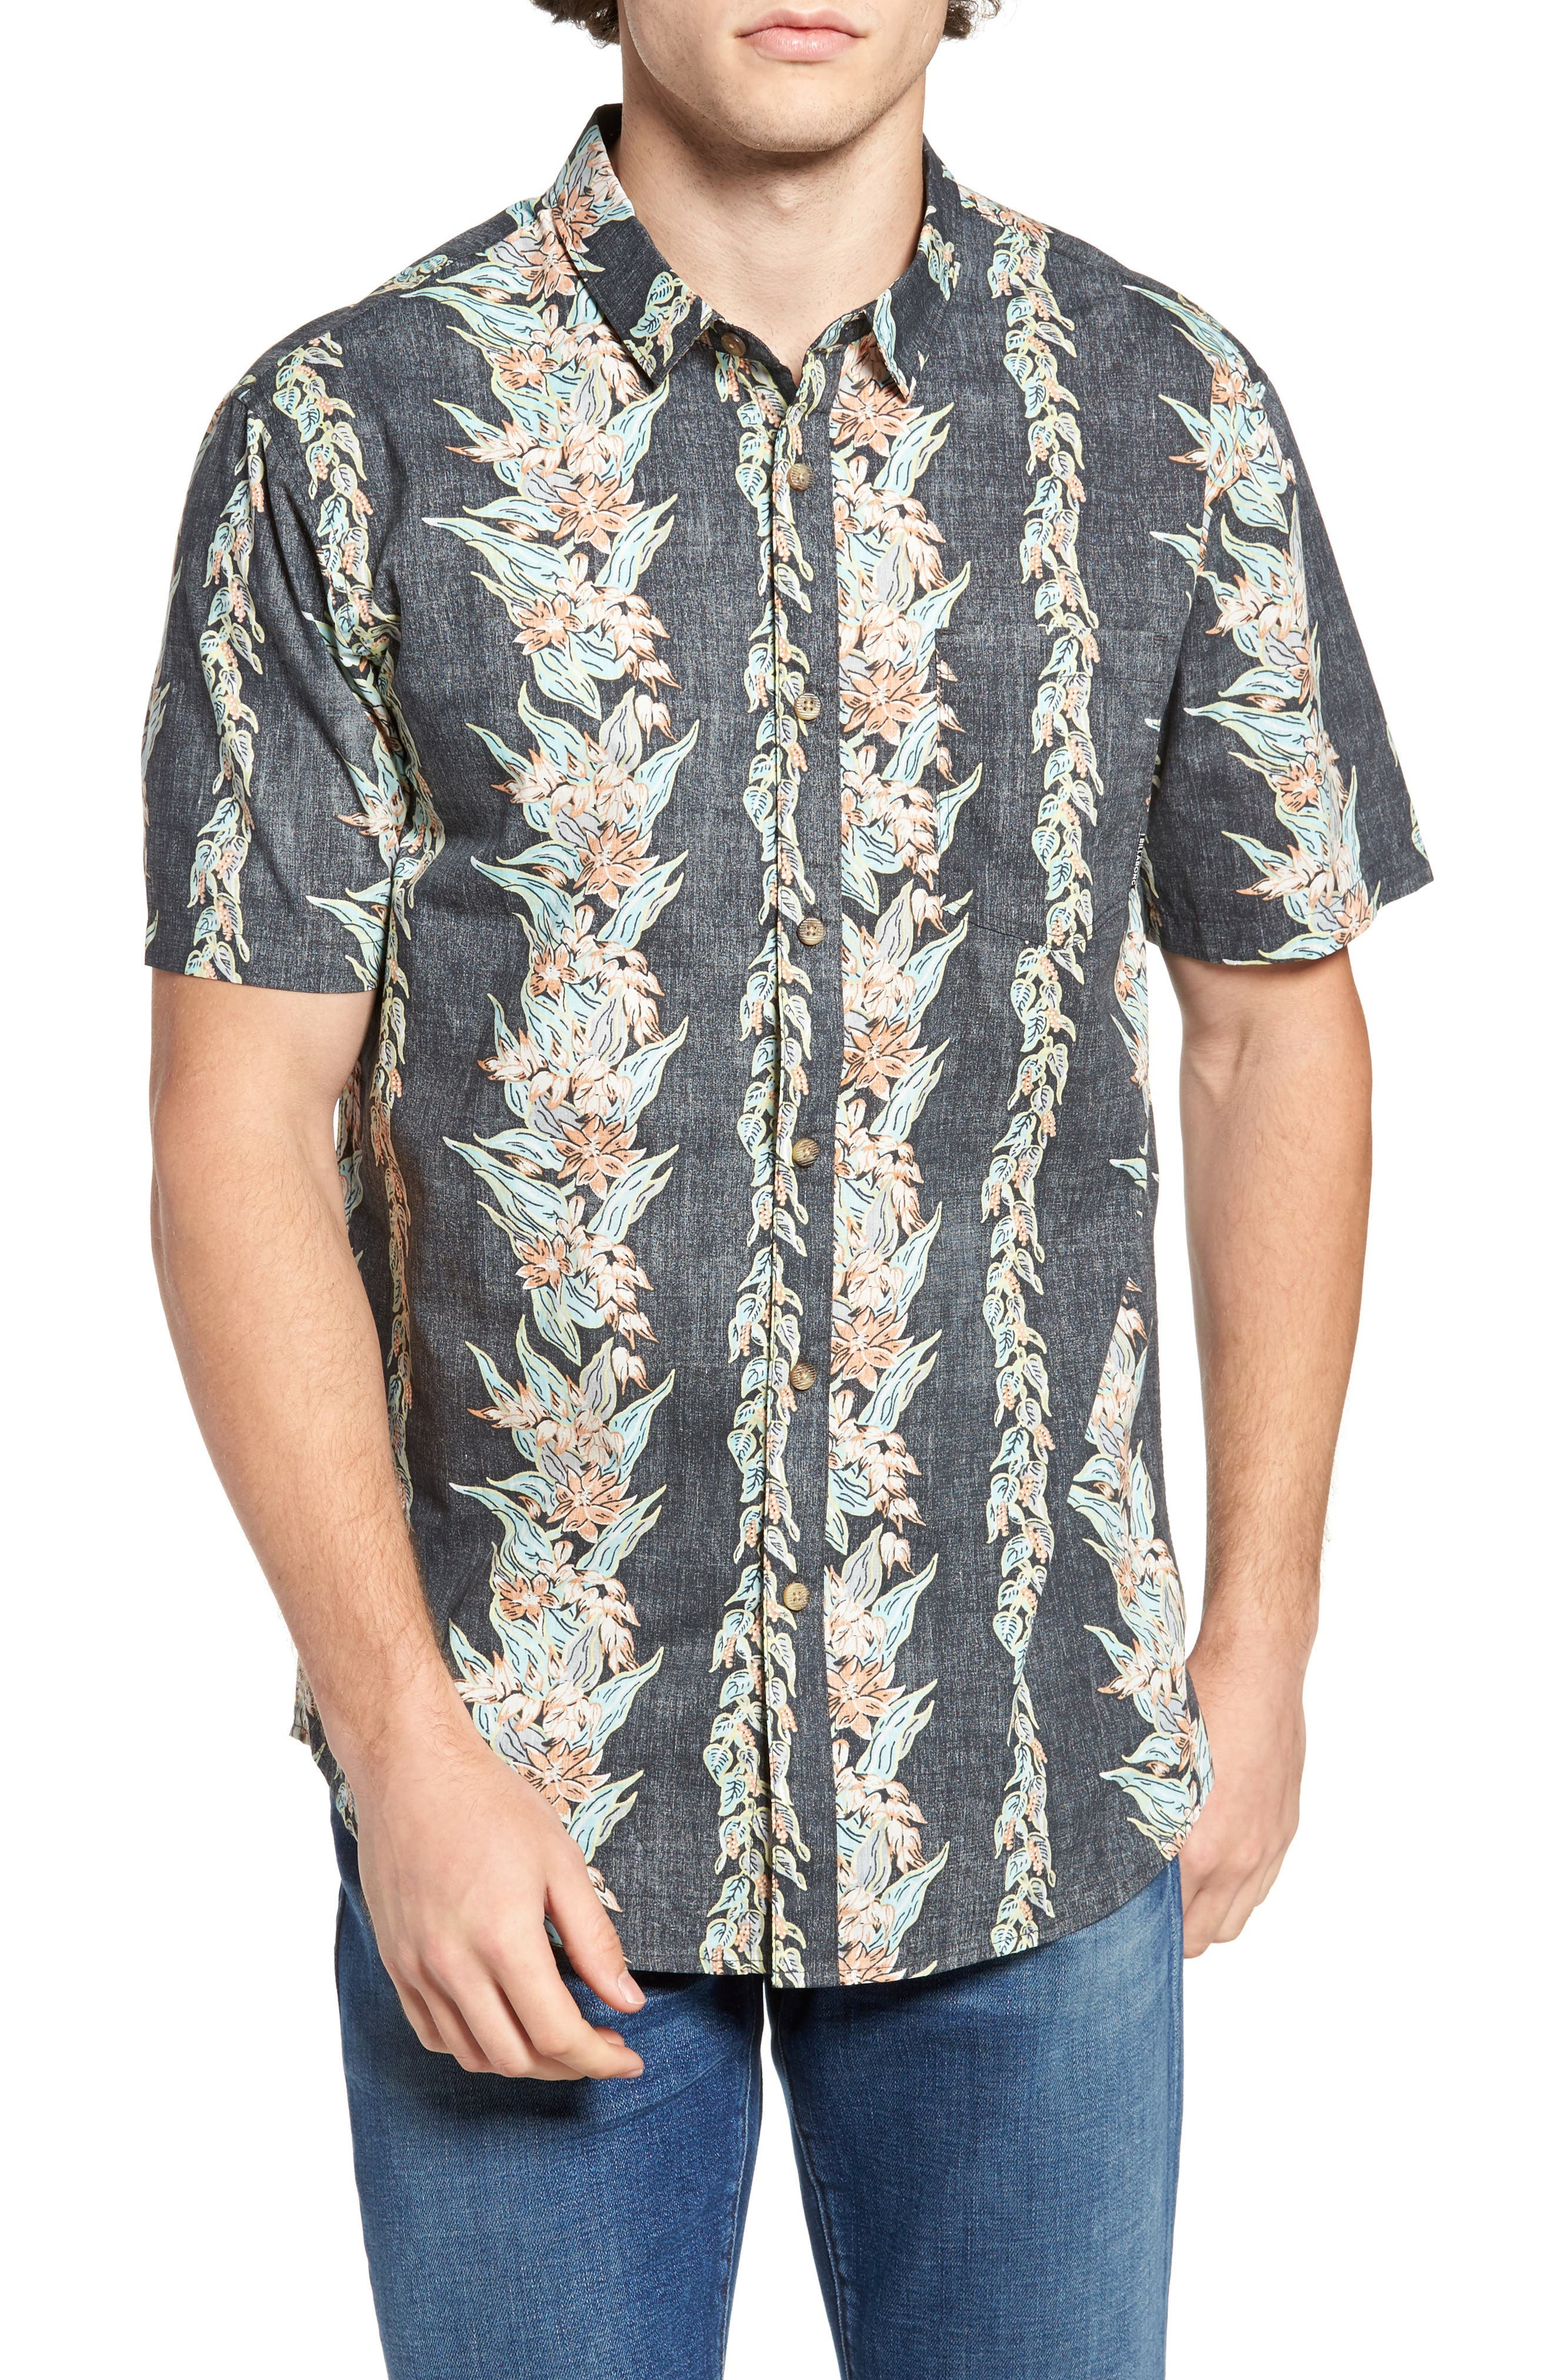 Main Image - Billabong Sundays Floral Woven Shirt